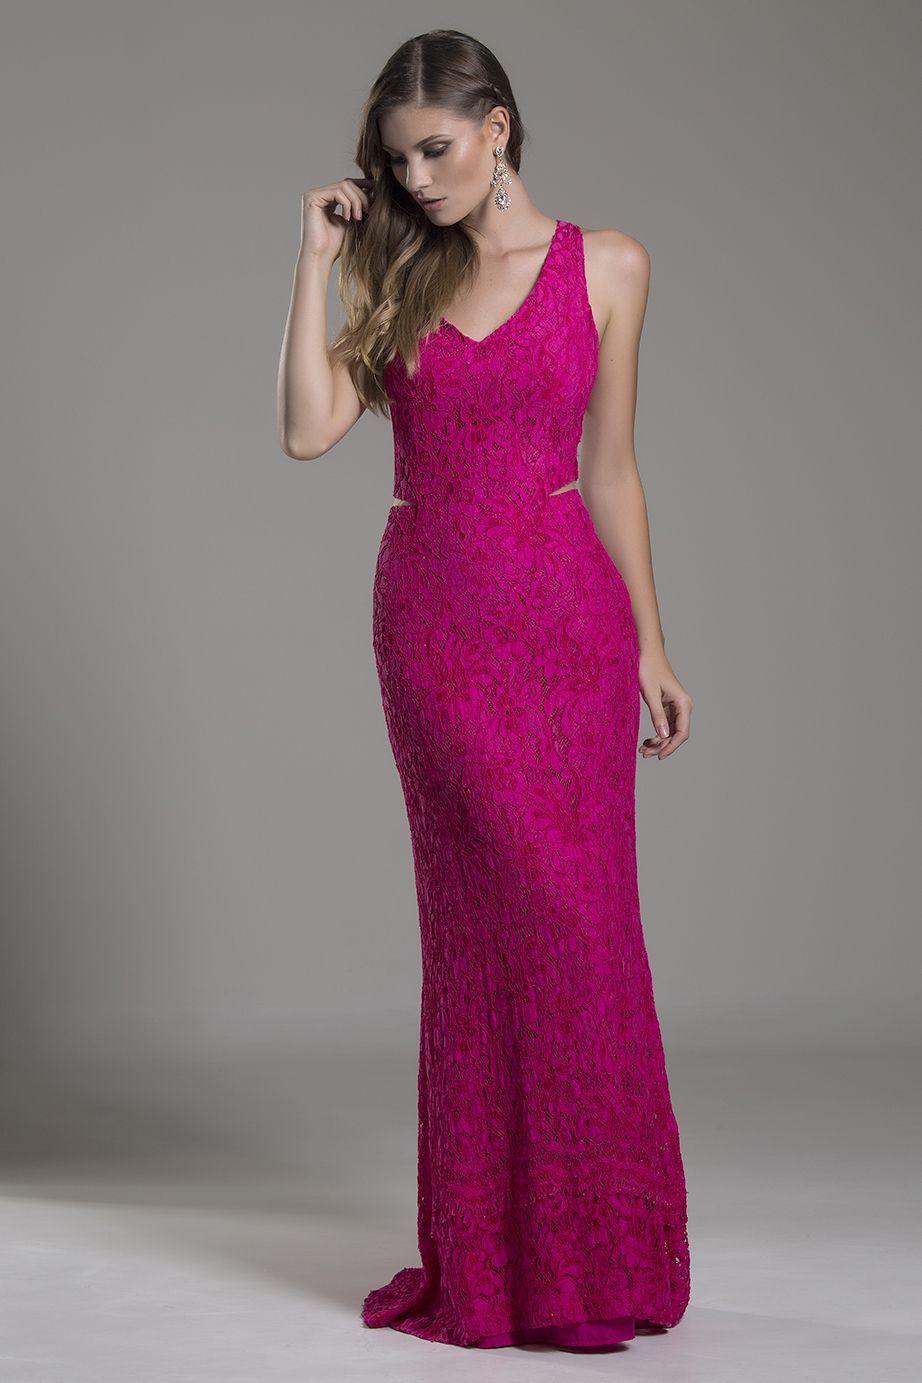 Resultado de imagem para vestido longo rosa | Lace | Pinterest ...